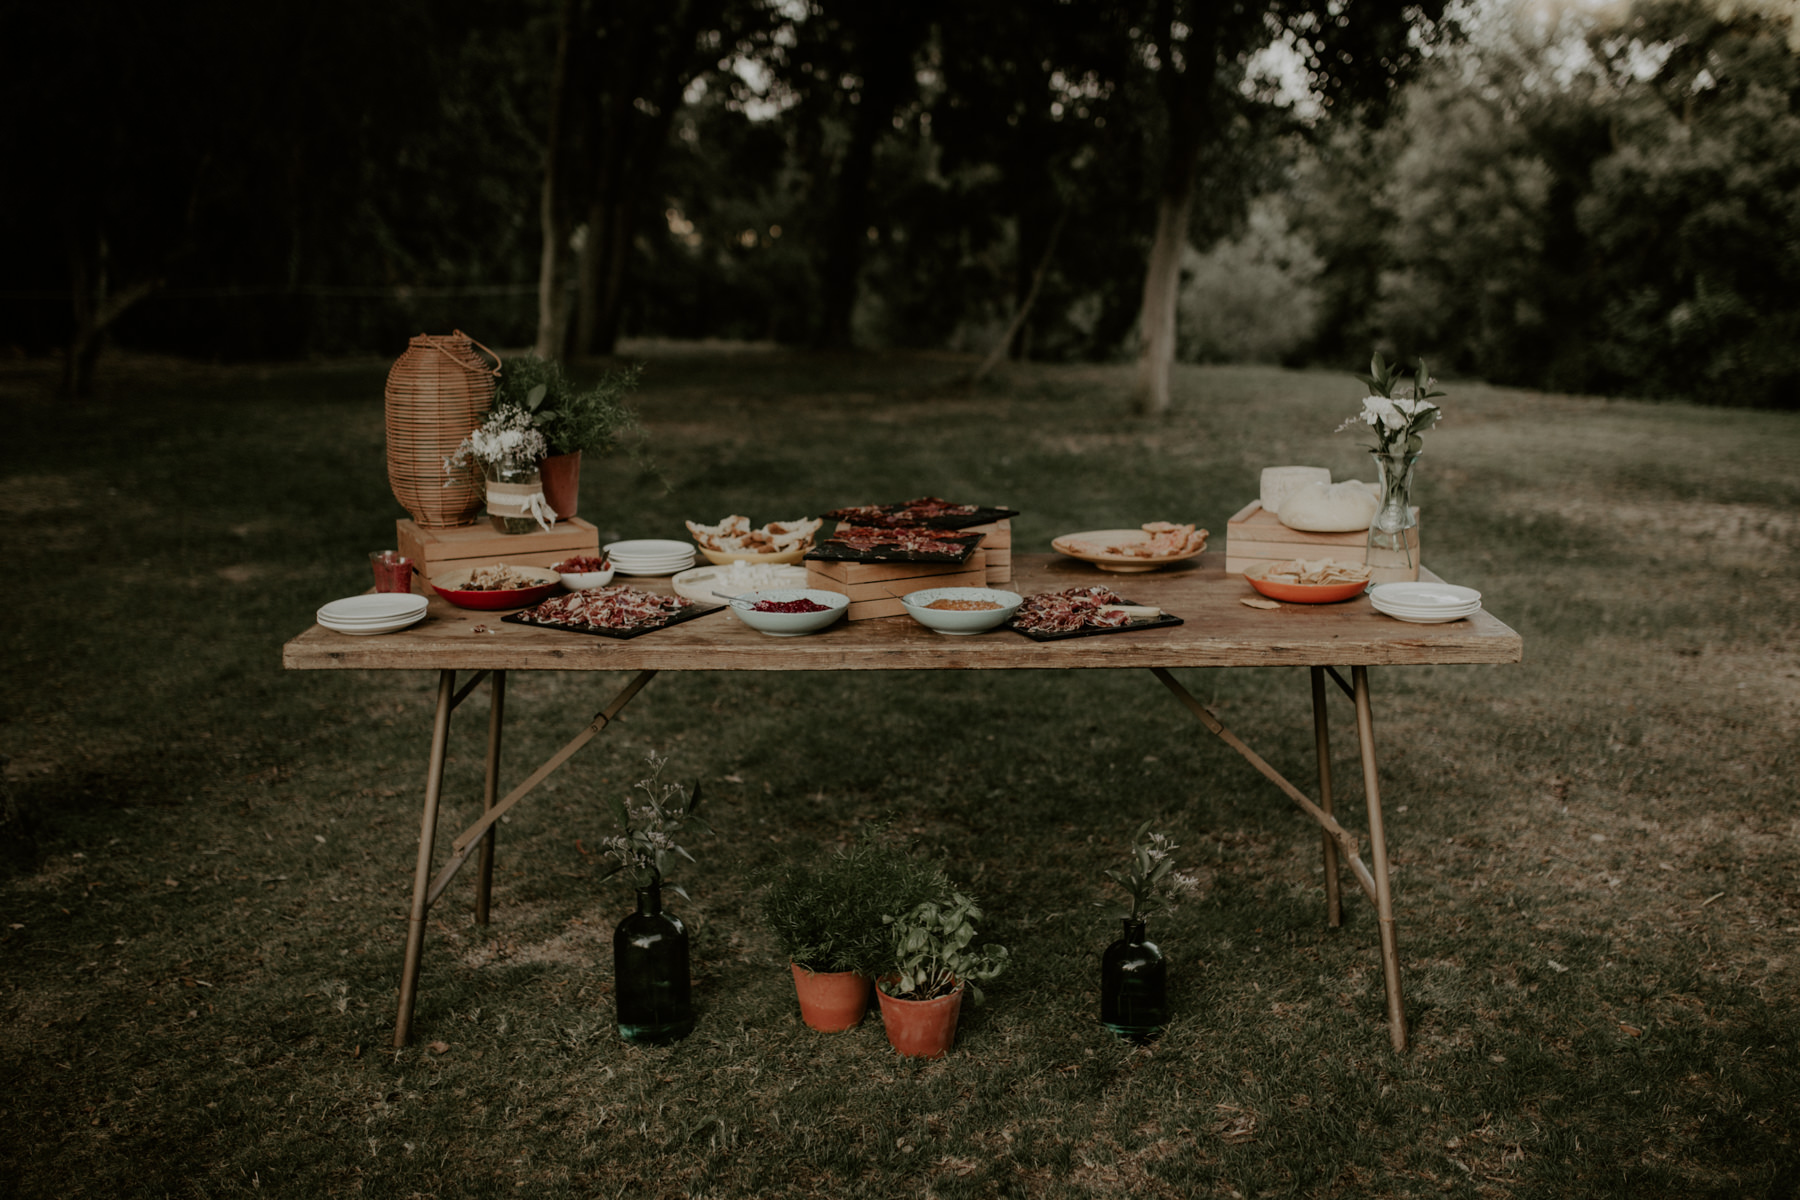 alt_thenortherngirlphotography_couples_weddingphotographer_photographer_wedding_boda_fotografodebodas_fotografobodasbarcelona_bodaindie_bodasconestilo_bodaensantperedeclara_jennifermiguel-585.jpg